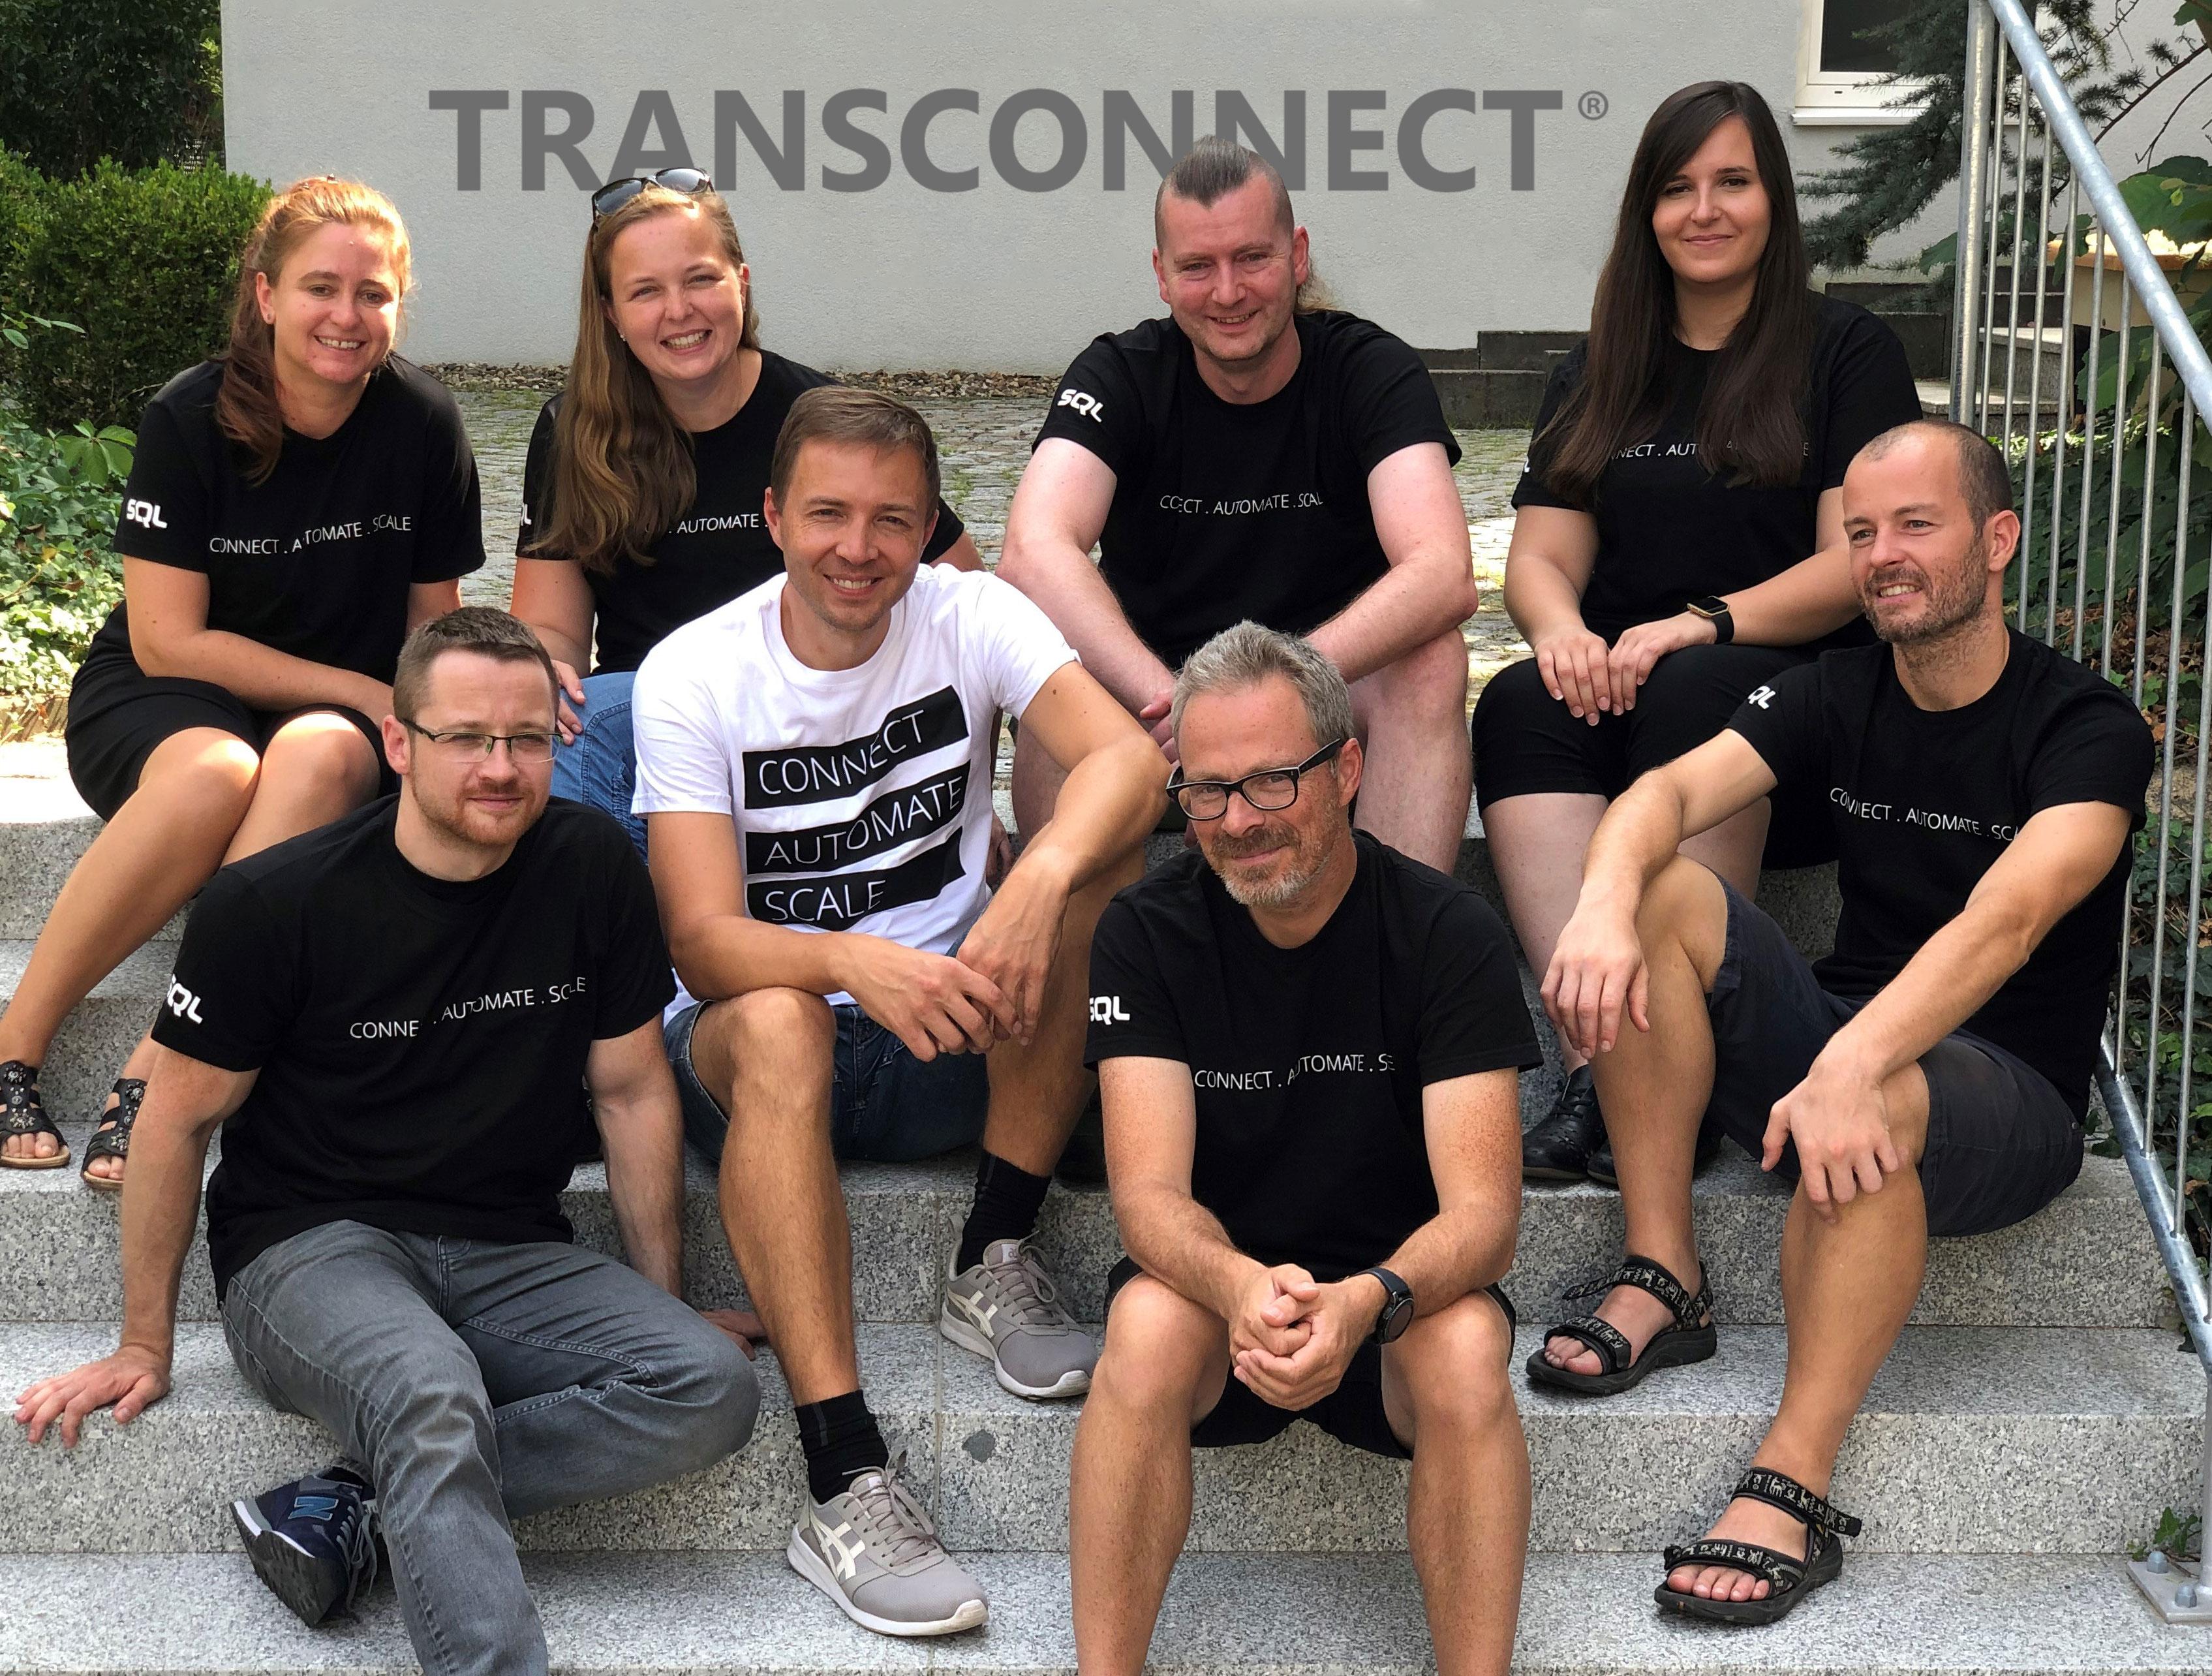 Das TRANSCONNECT®-Team